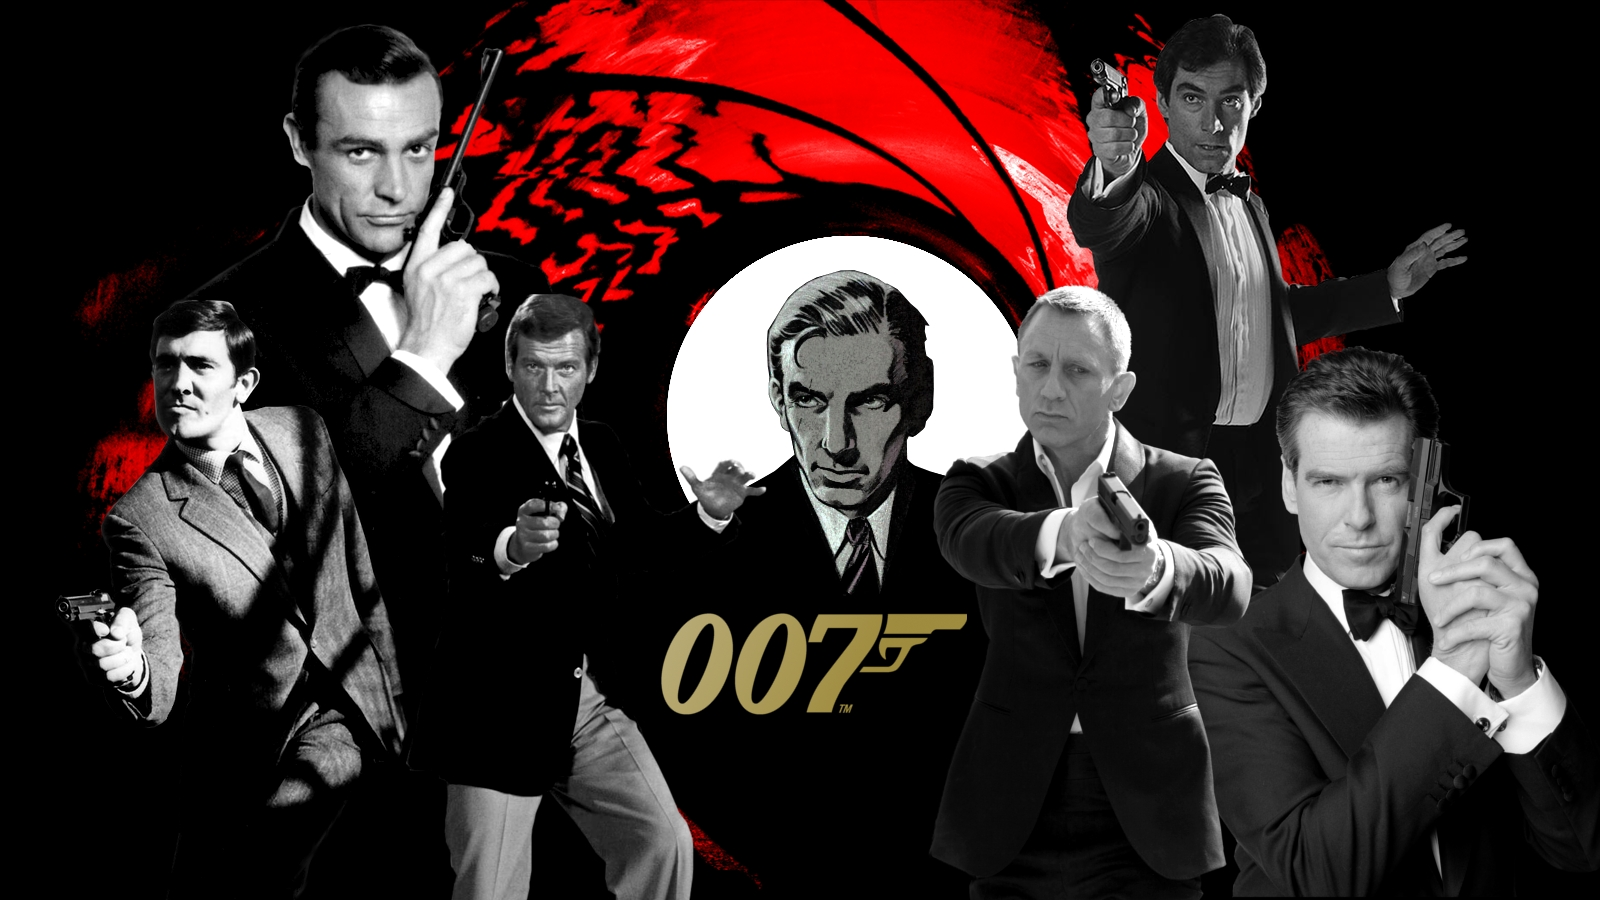 james bond 007 wallpaper wallpapersafari. Black Bedroom Furniture Sets. Home Design Ideas